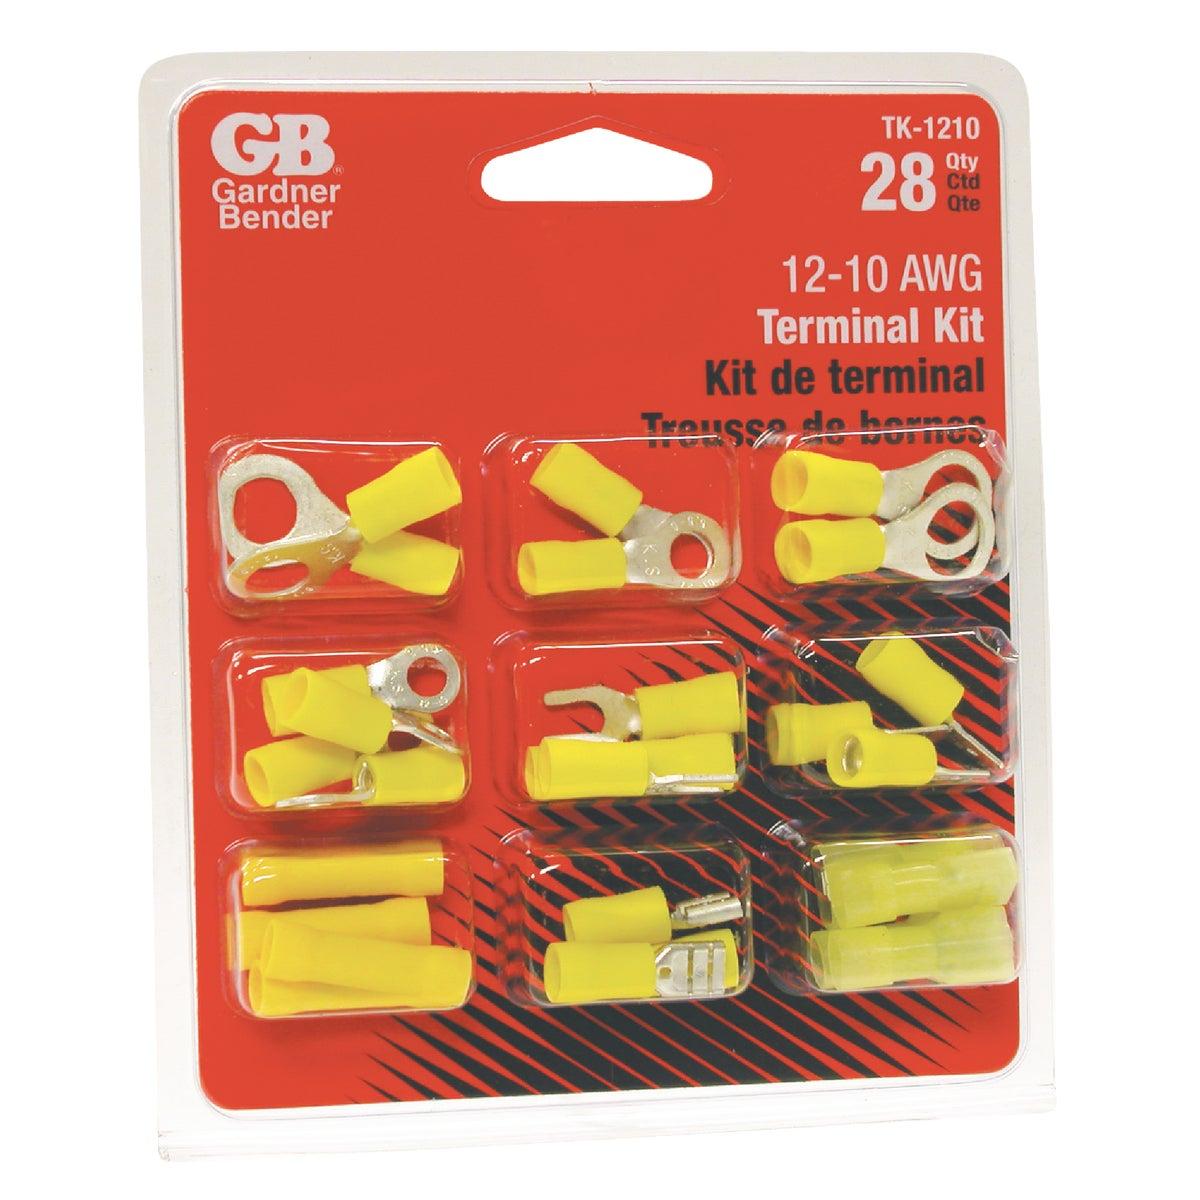 12-10 AWG TERMINAL KIT - TK-1210 by G B Electrical Inc